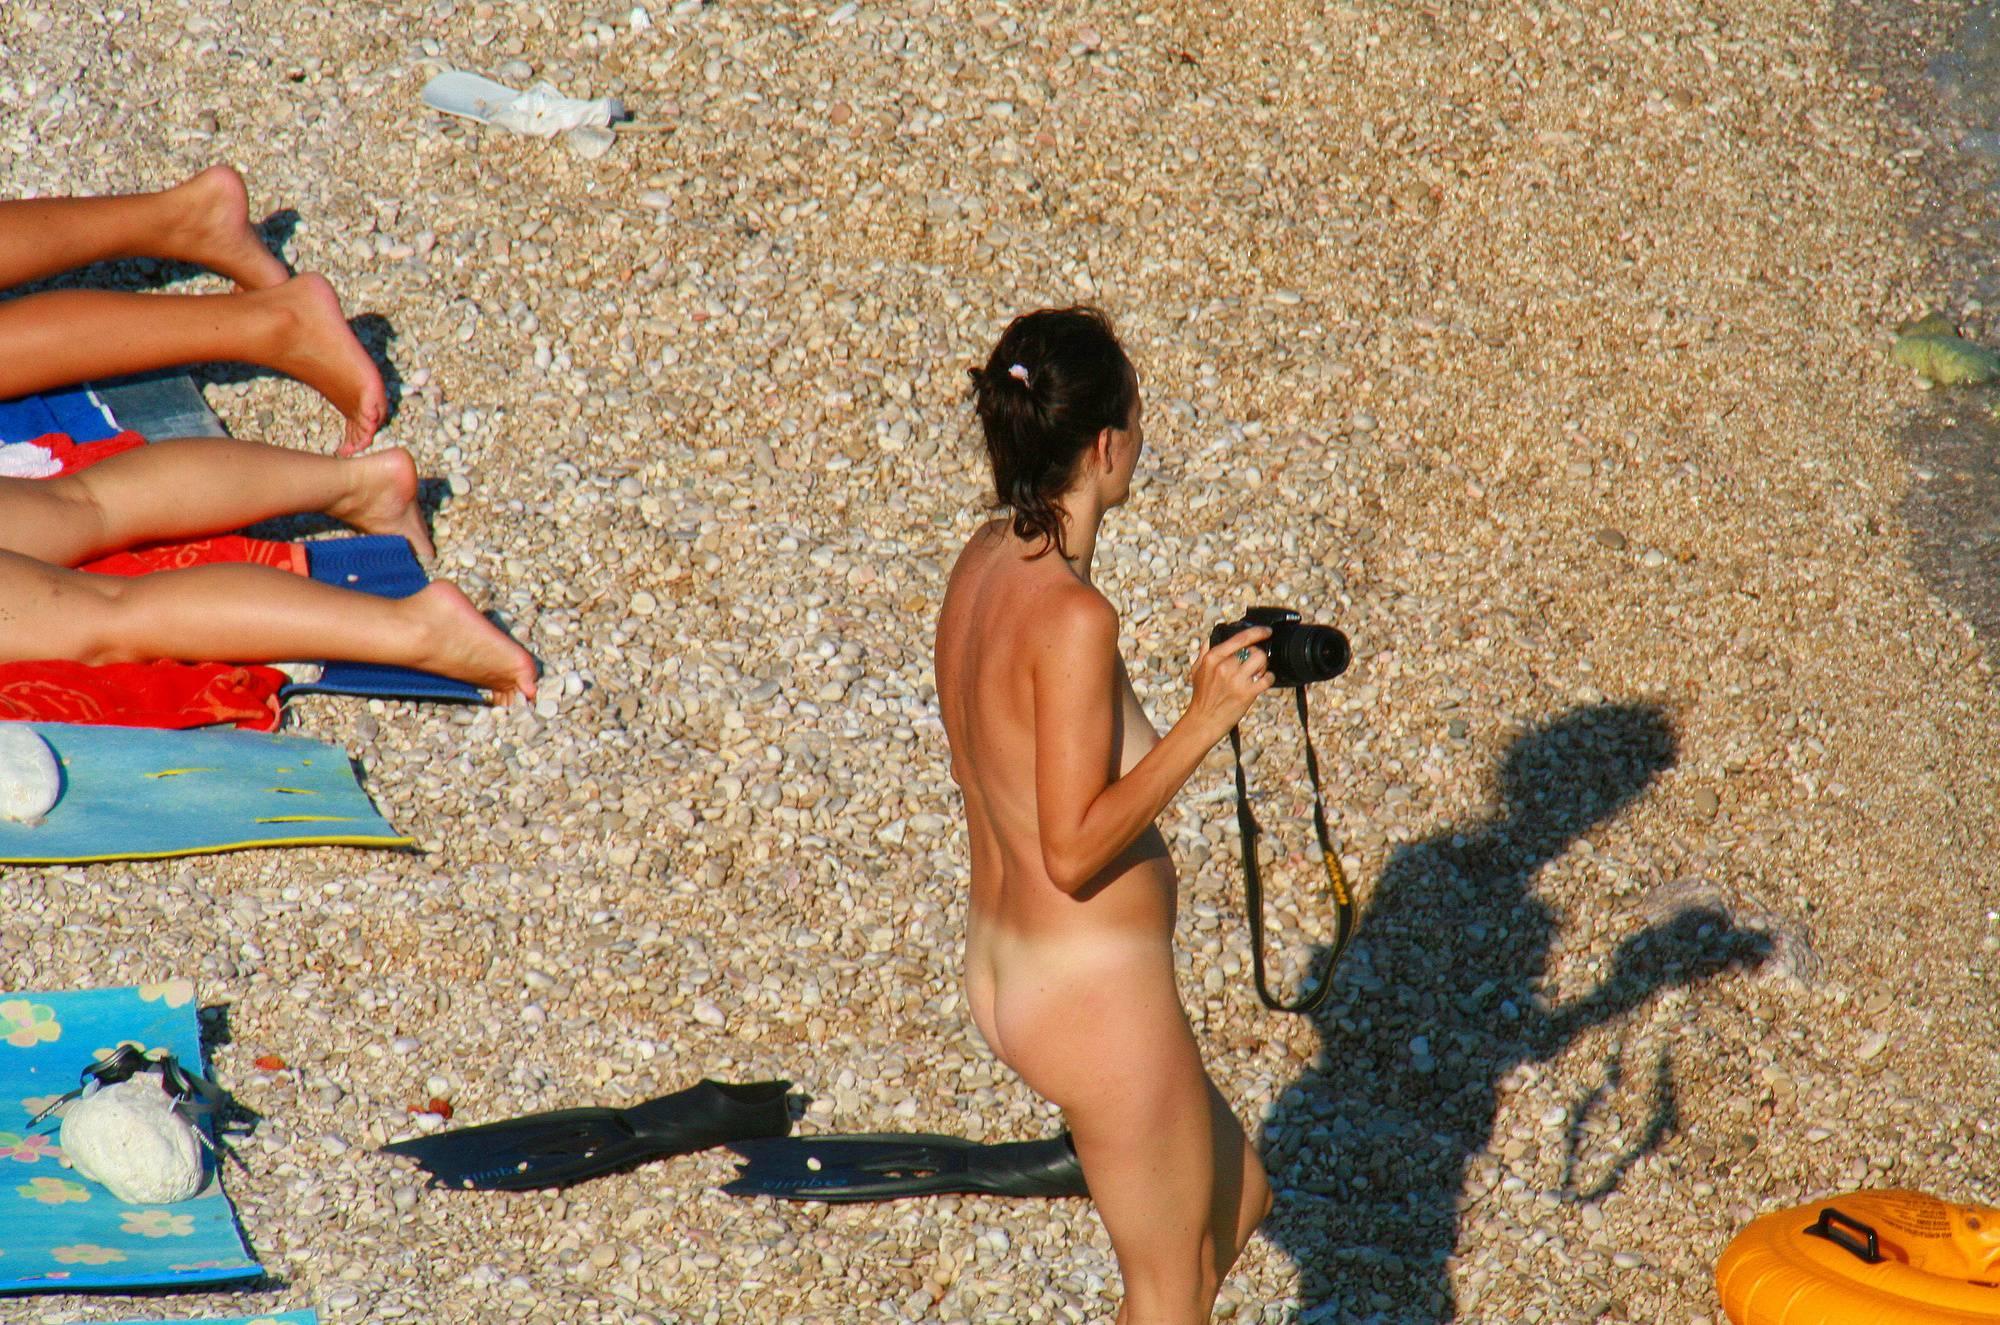 Nudist Photos Ula FKK Toddler Memories - 2